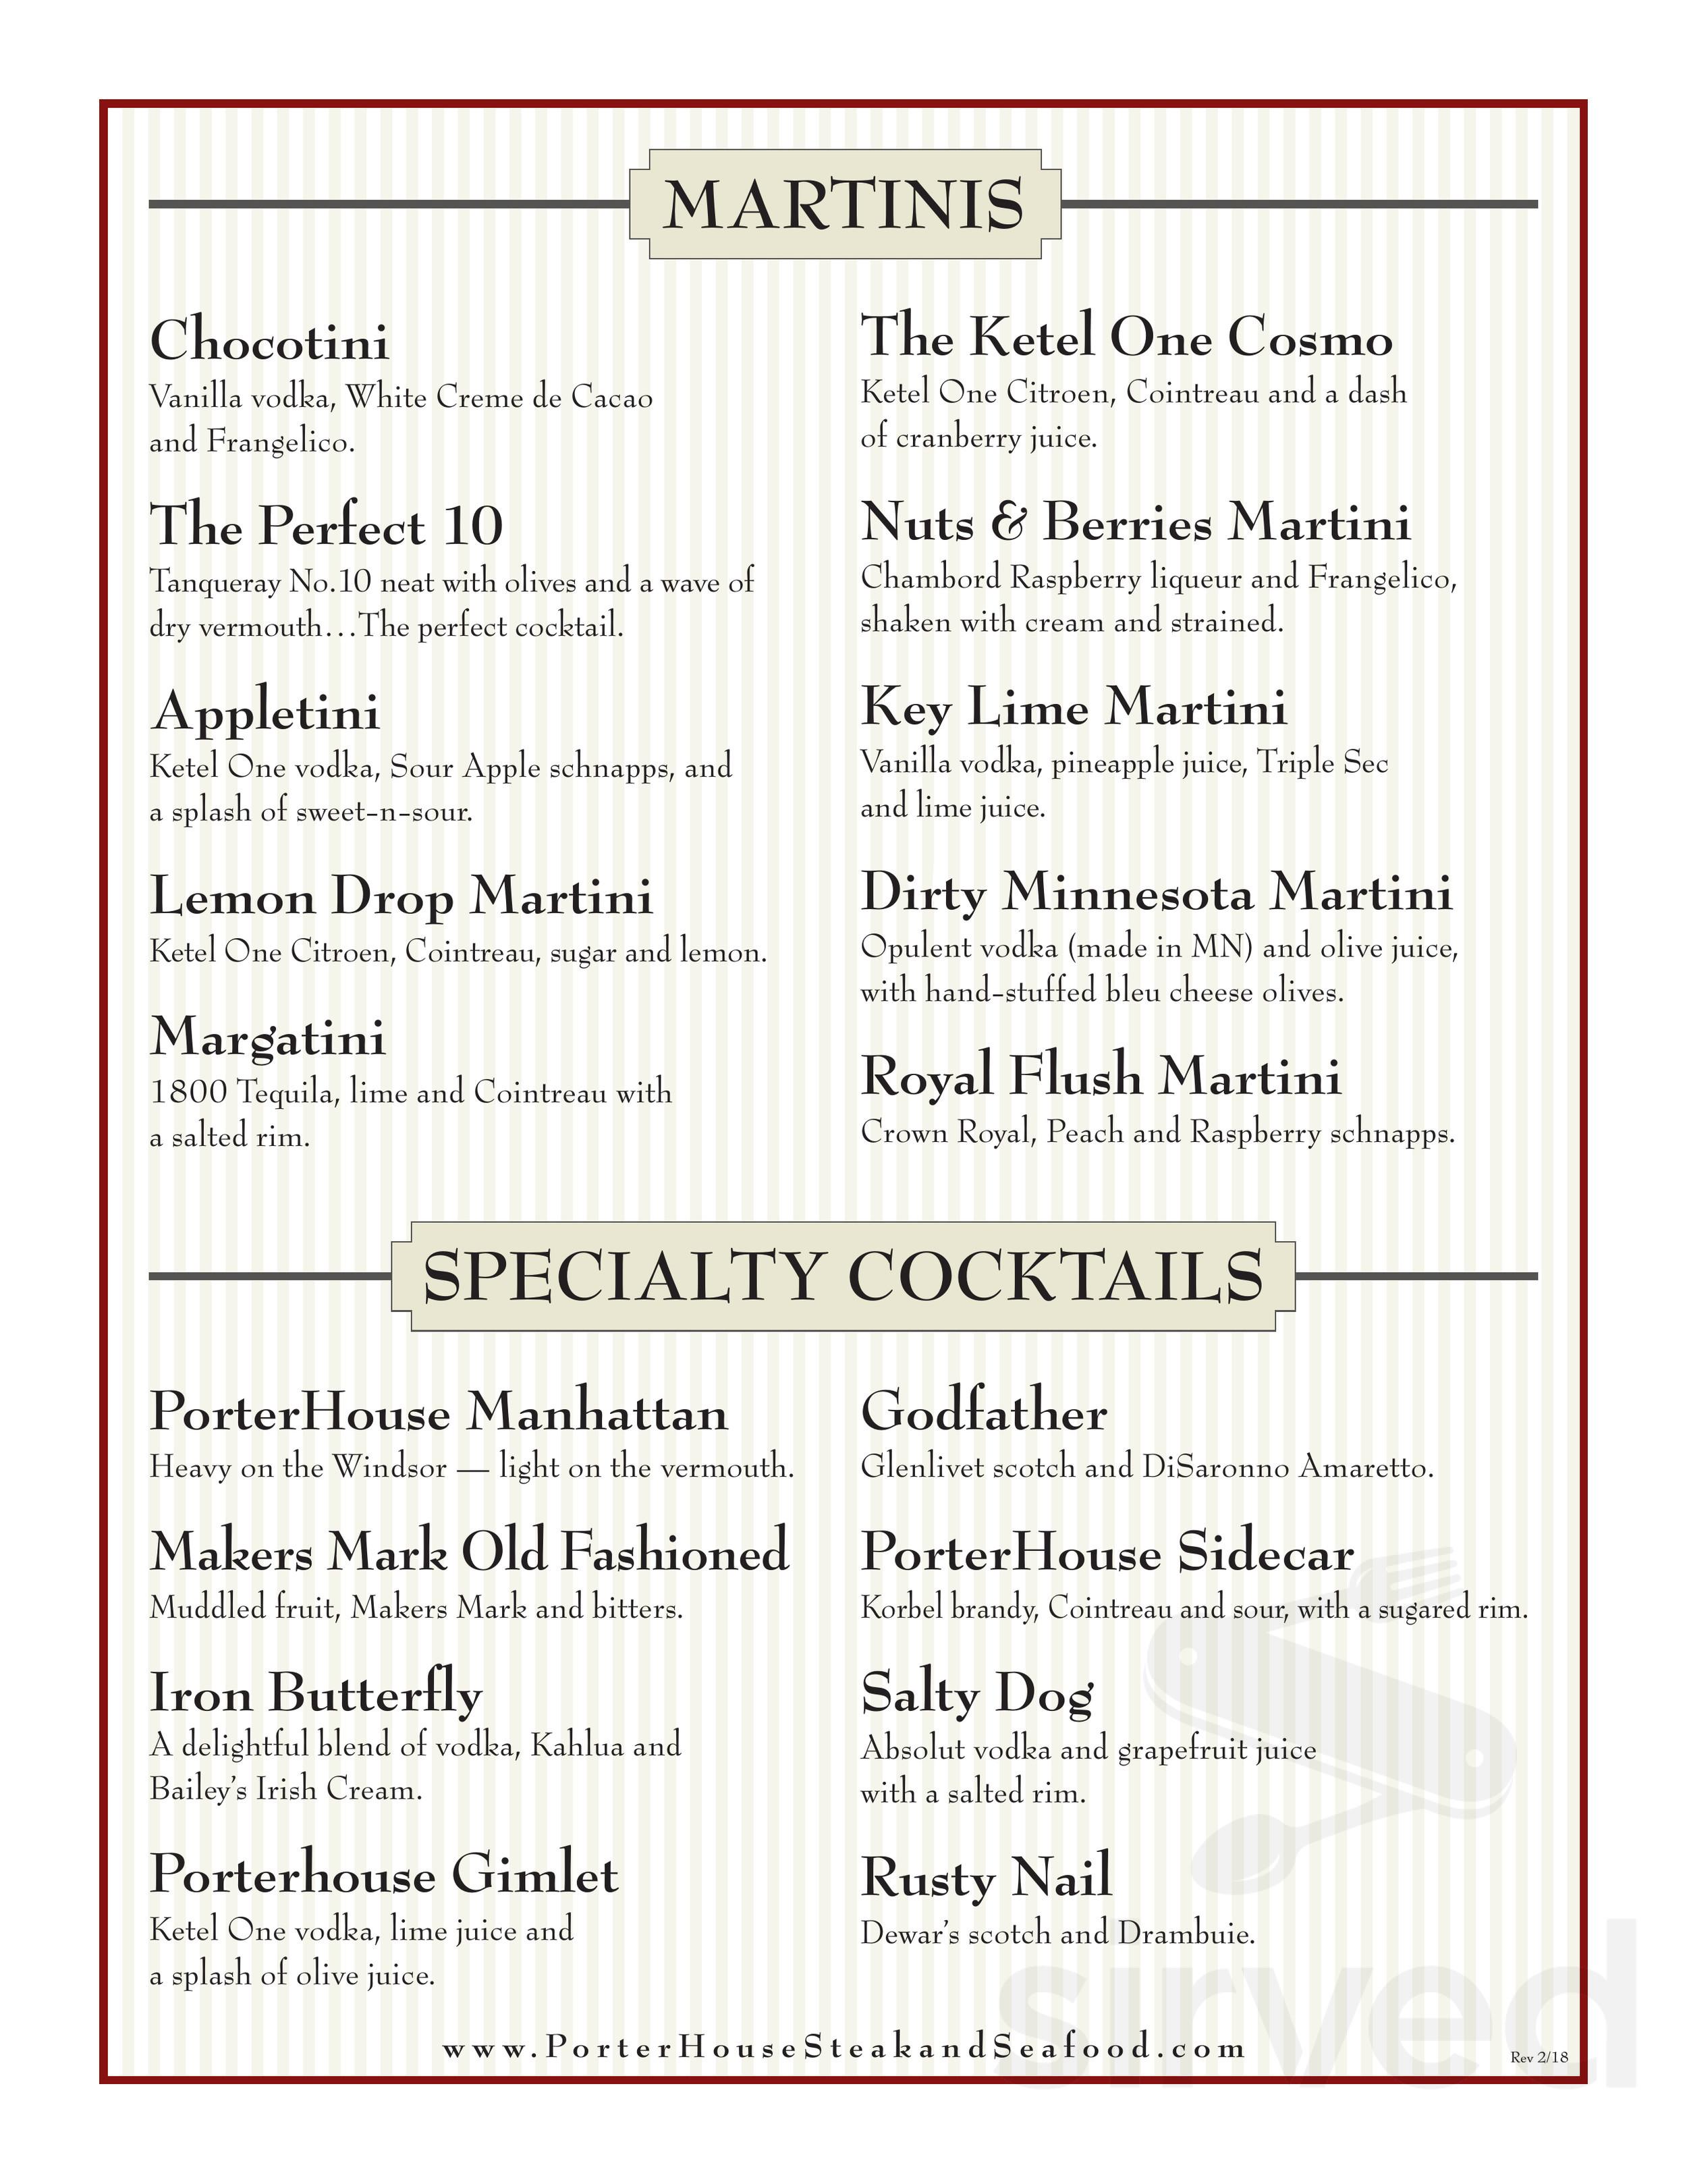 Menu For Porterhouse Steak Seafood Restaurant In Lakeville